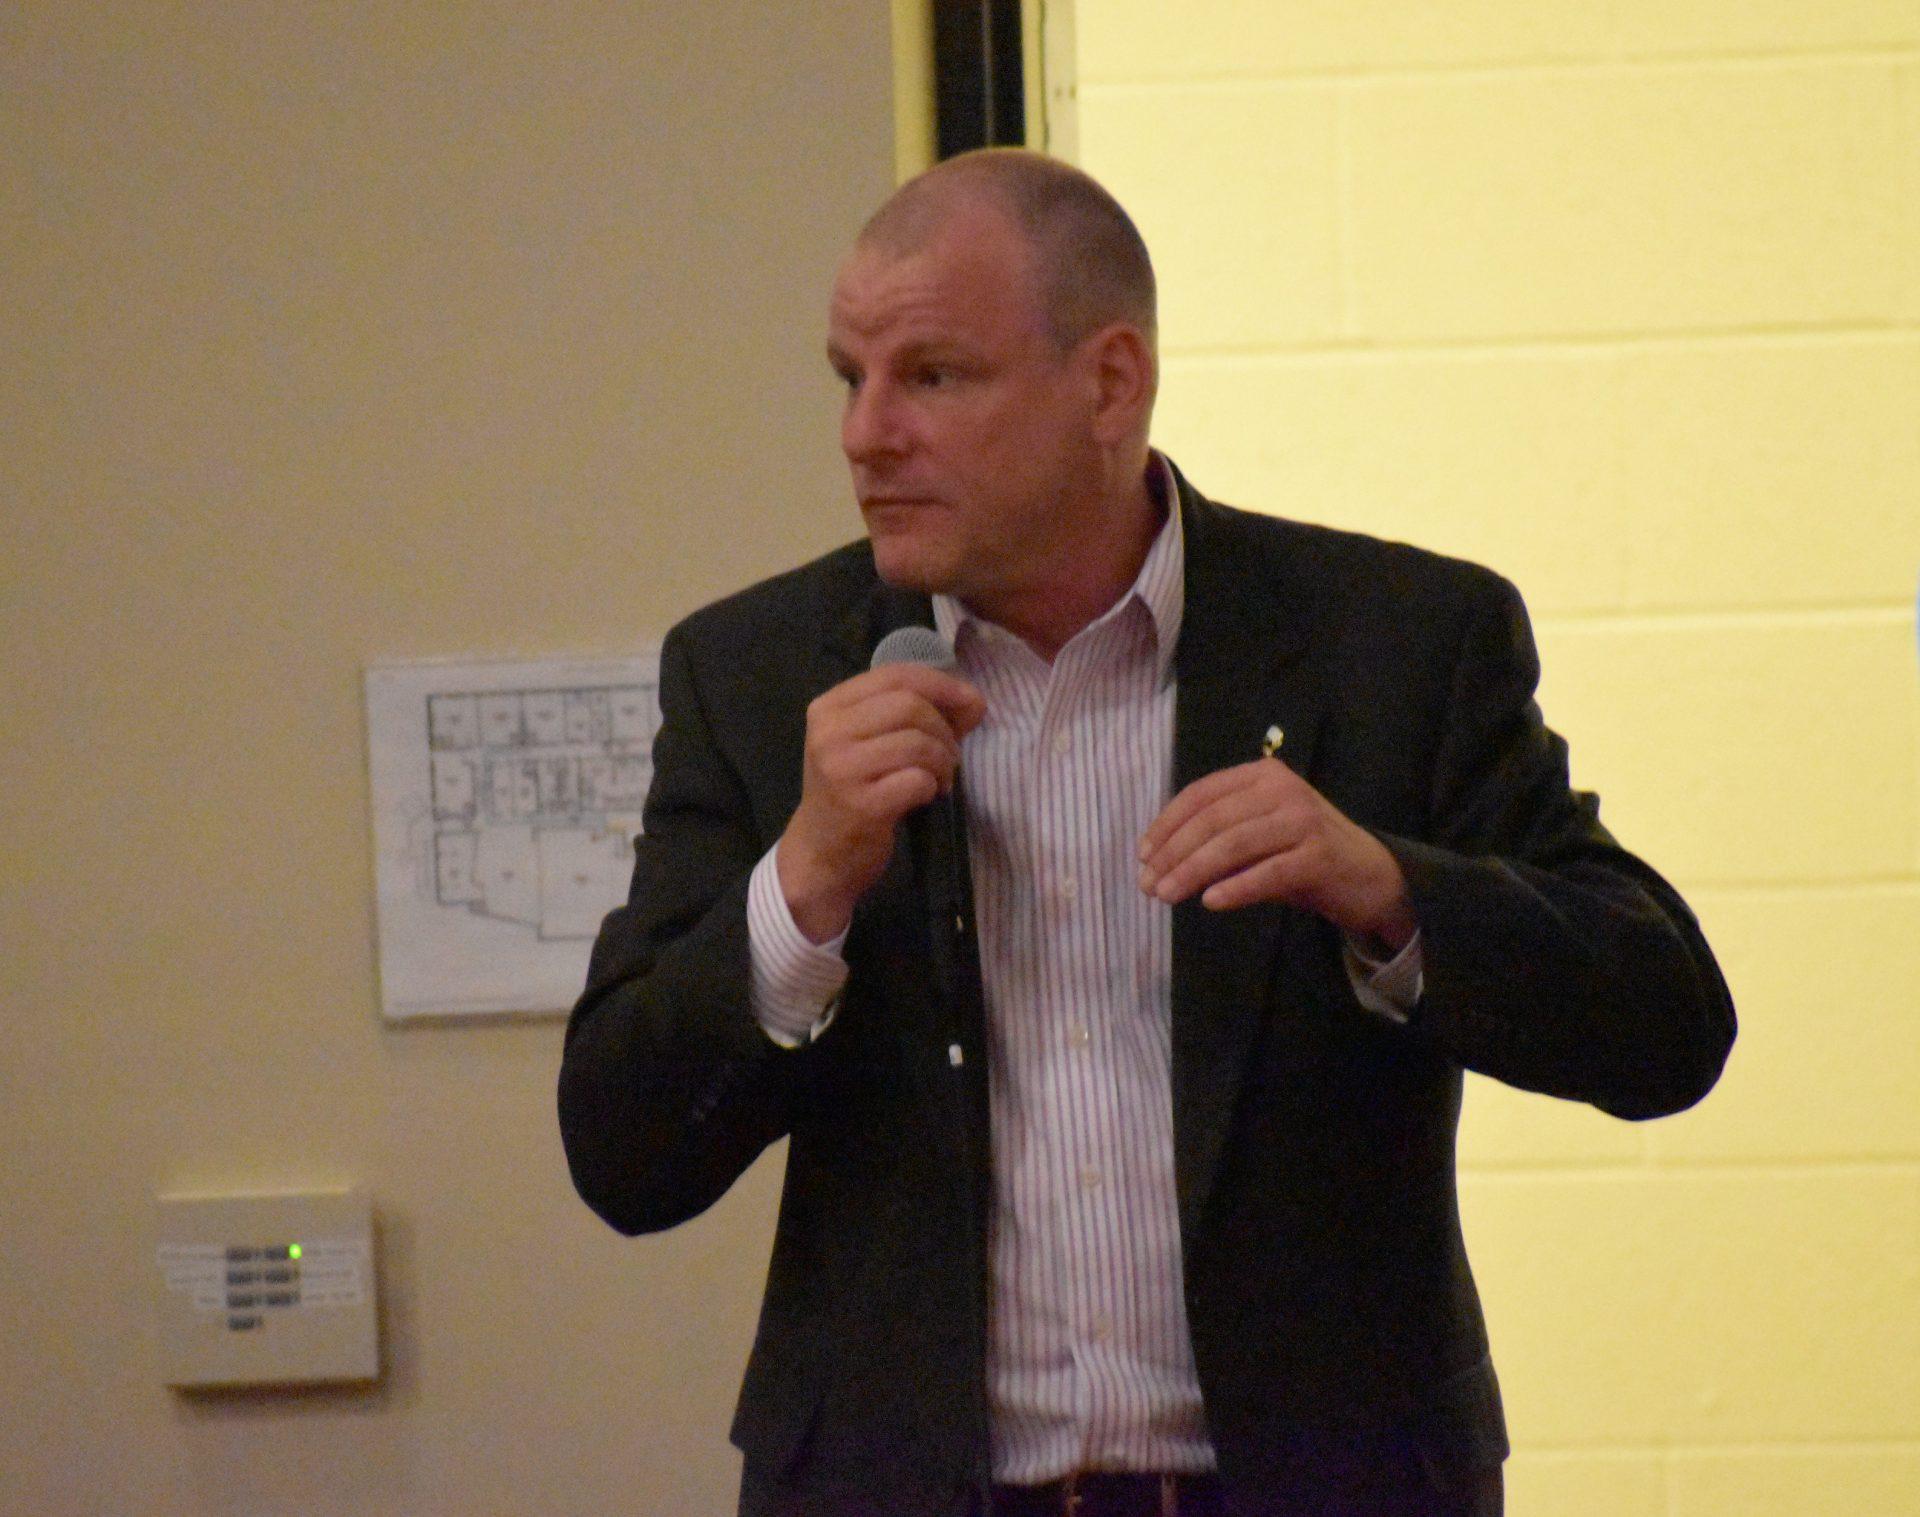 York Mayor Michael Helfirch speaks during a community event on April 23, 2019.